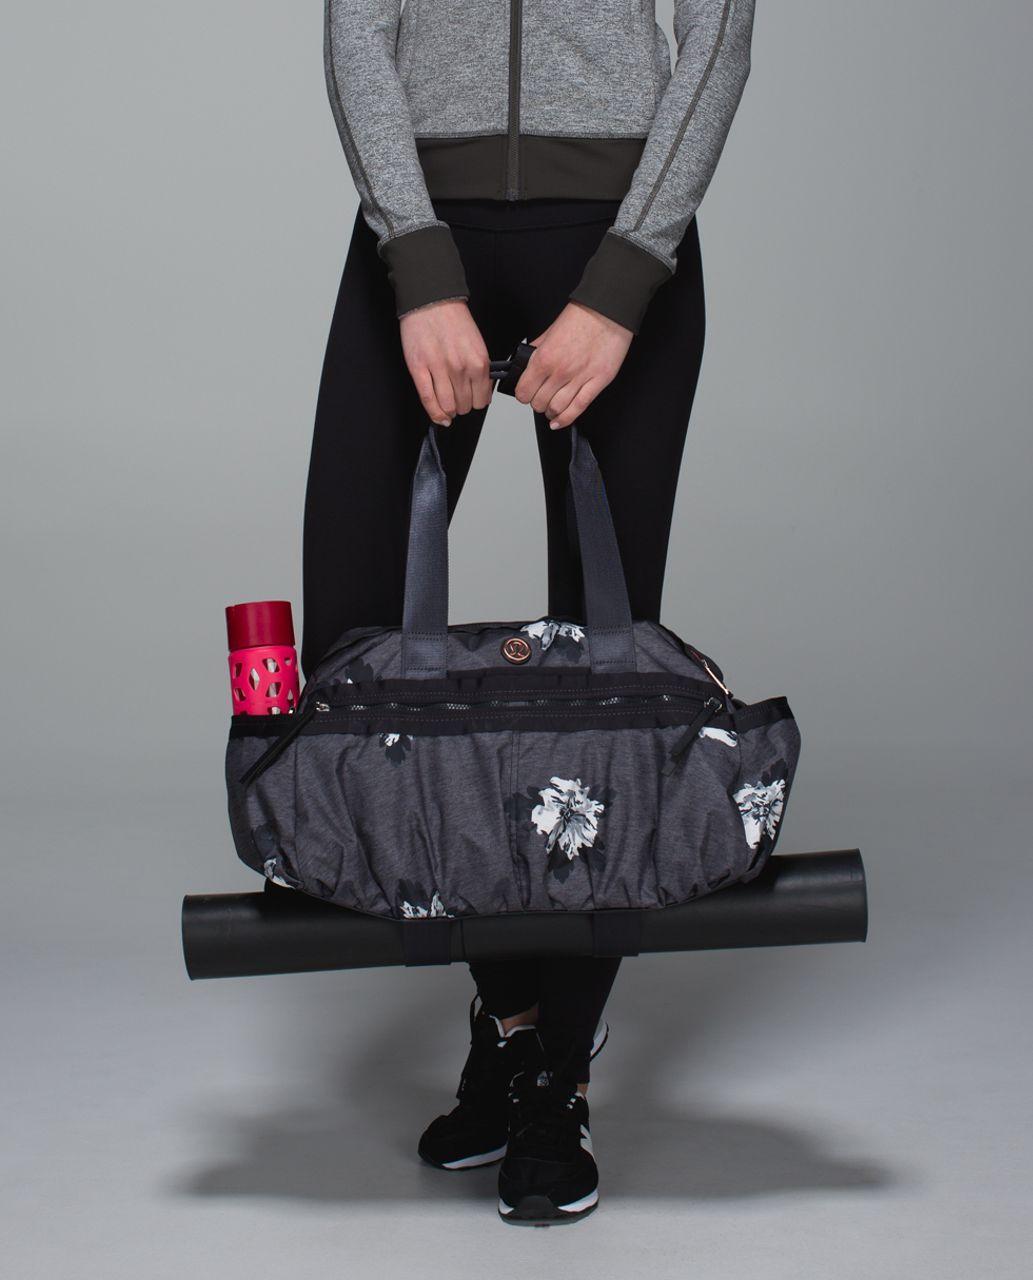 Lululemon Gym To Win Duffel *Polyester - Atomic Flower Silver Spoon Black